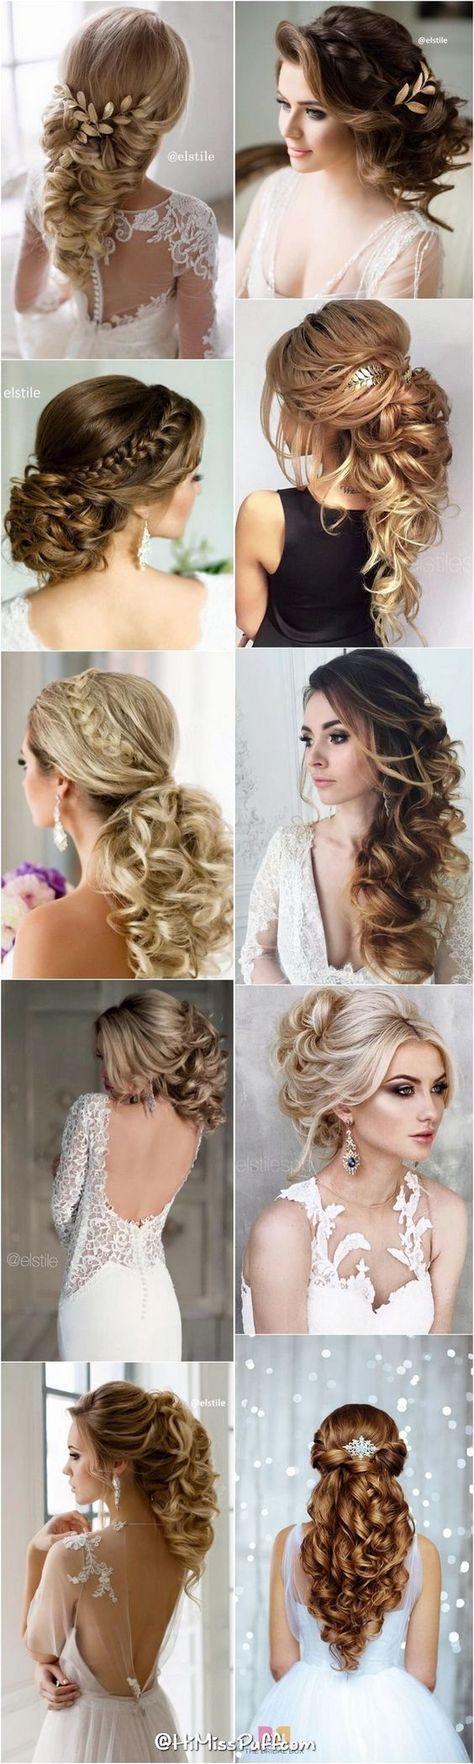 Derfrisuren.top DIY Long Half Up Half Down Prom Wedding Hairstyle Tutorial wedding Tutorial Prom Long hairstyle DIY